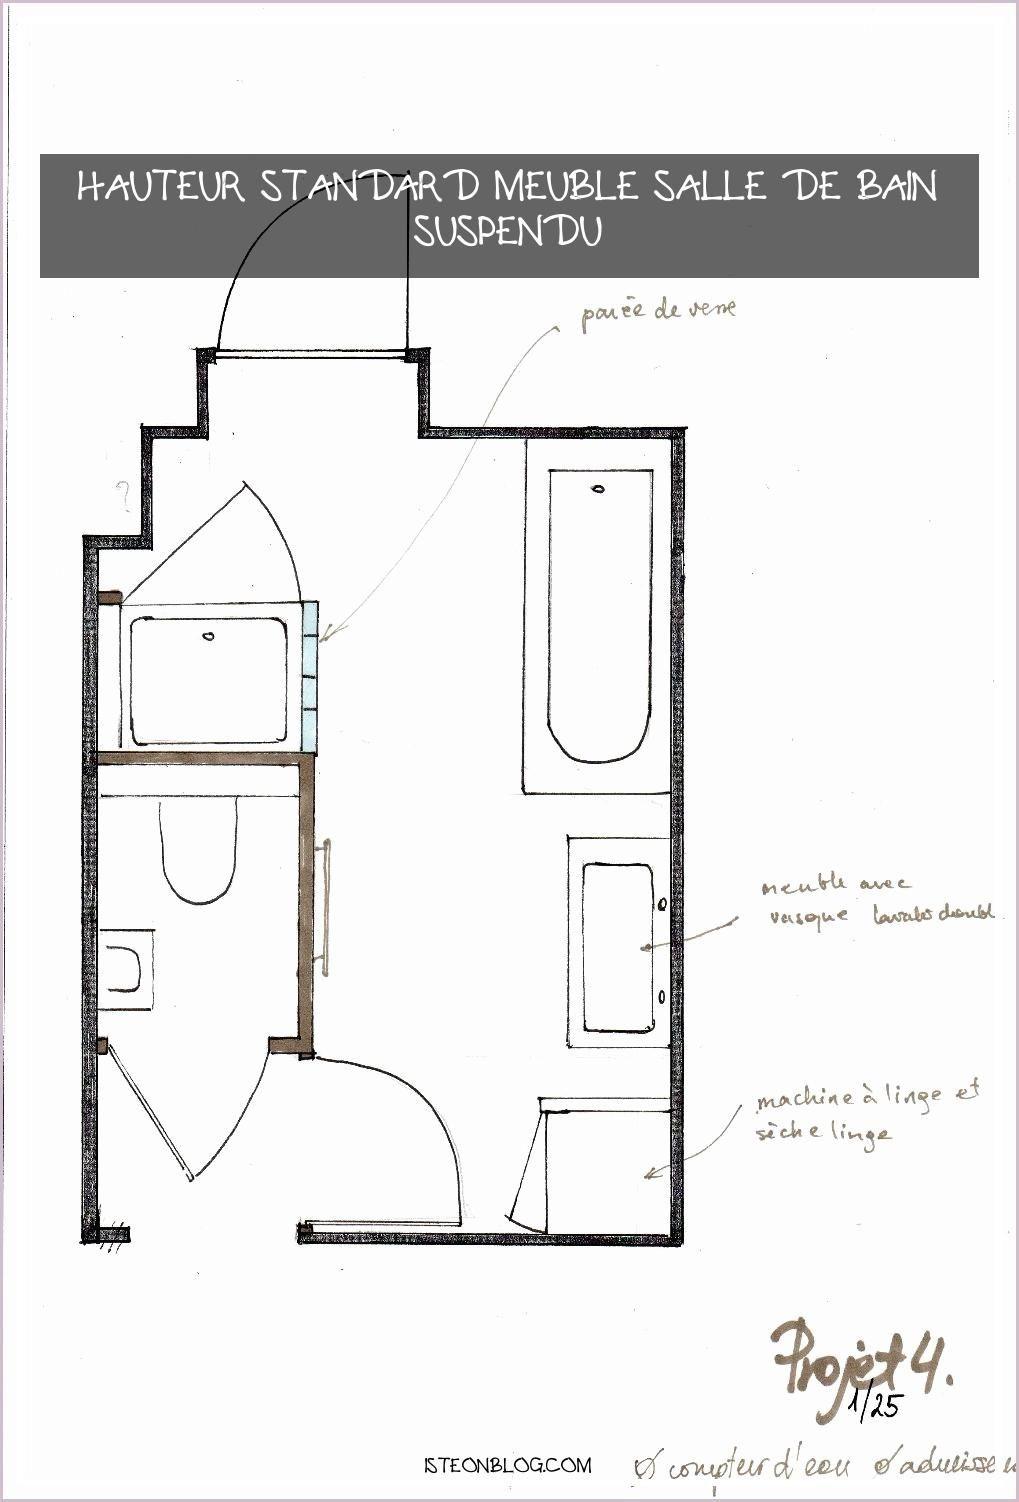 17+ Hauteur standard meuble salle de bain suspendu inspirations